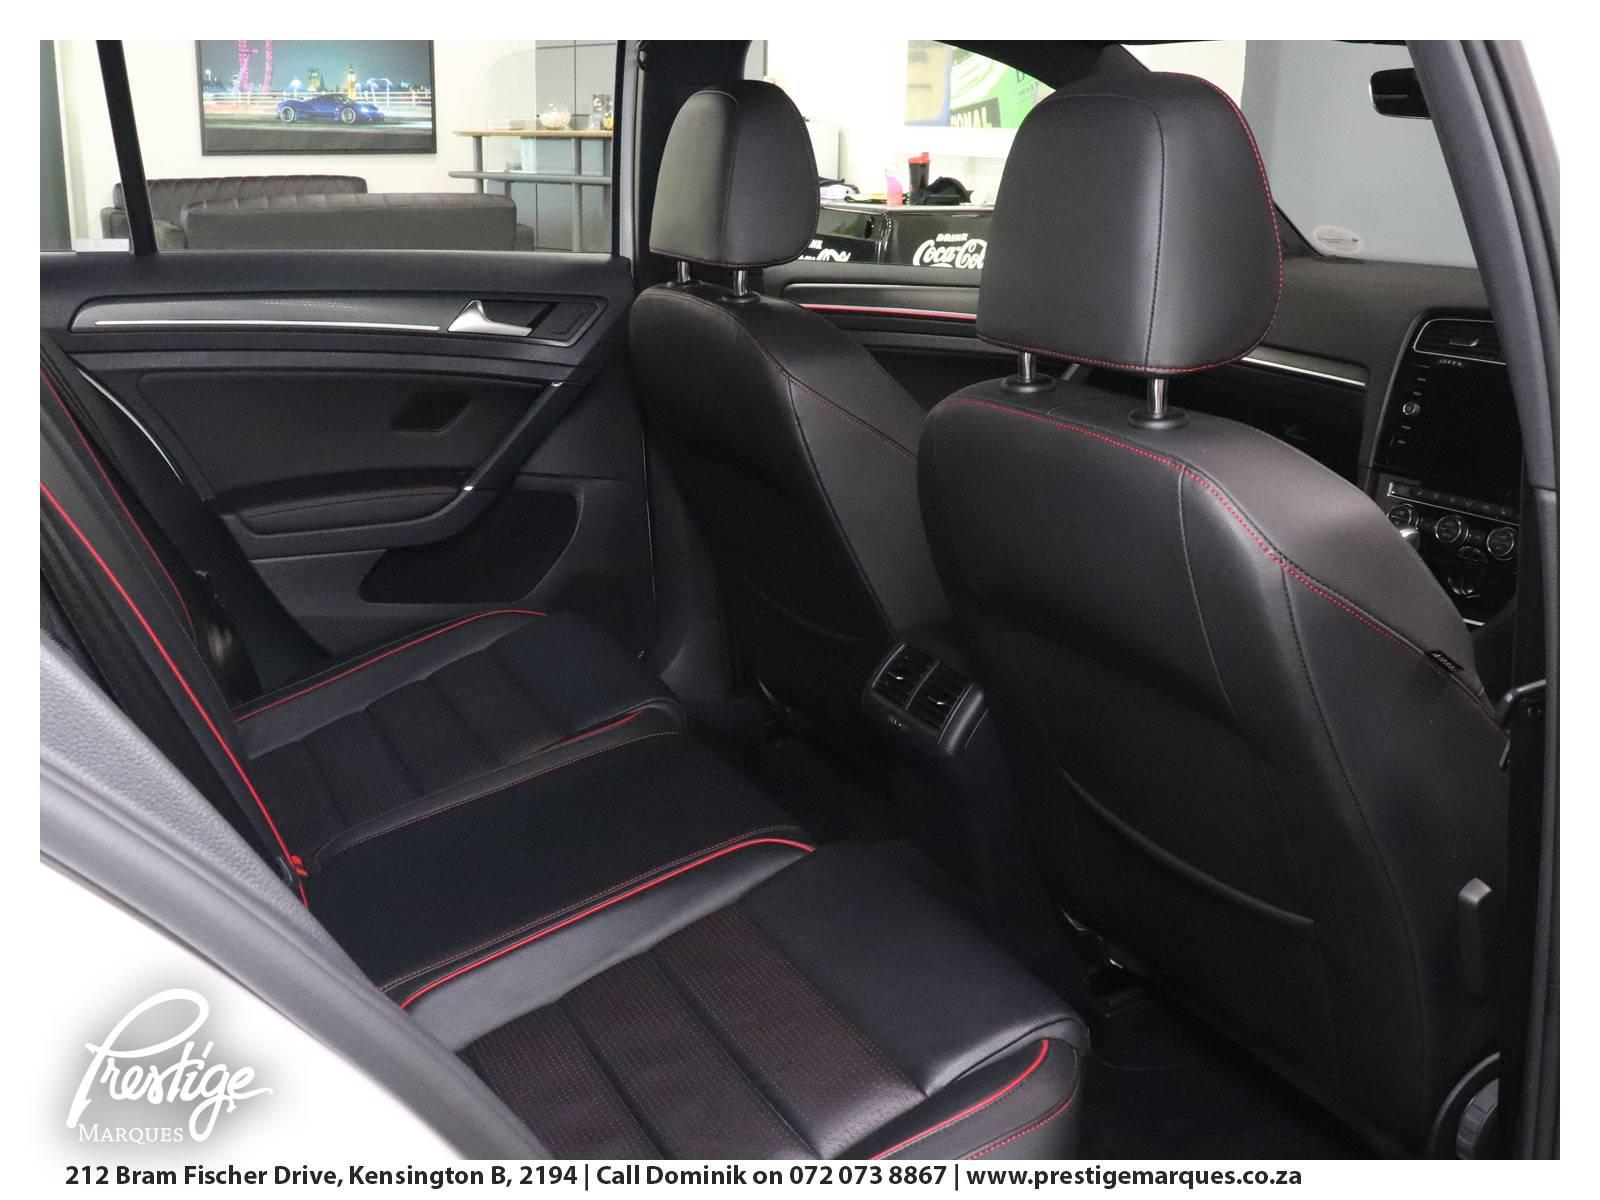 2017-Volkswagen-Golf-GTI-DSG-Facelift-Prestige-Marques-Randburg-Sandton-16